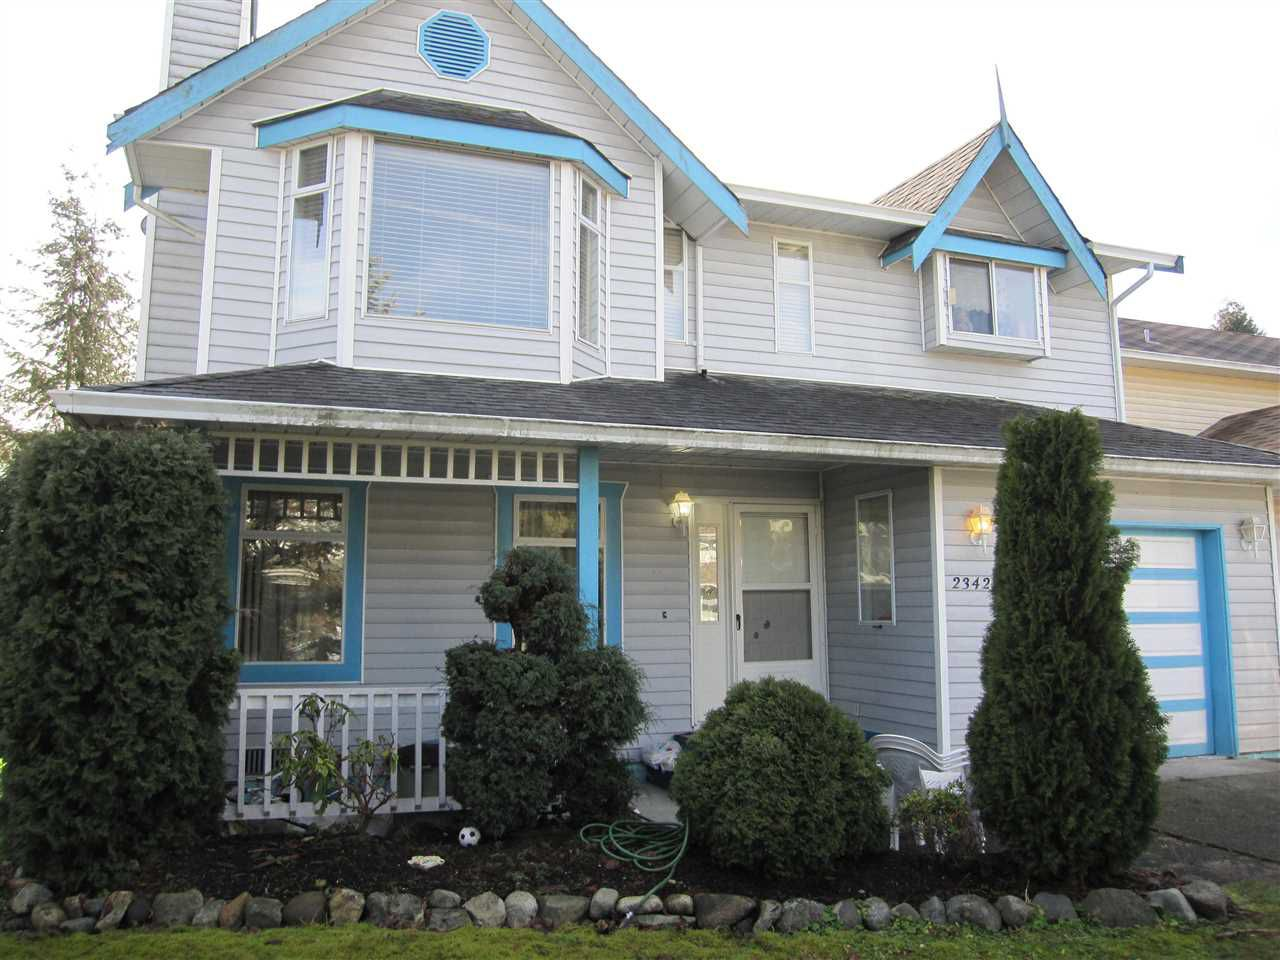 Main Photo: 23422 SANDPIPER Avenue in Maple Ridge: Cottonwood MR House for sale : MLS®# R2034092